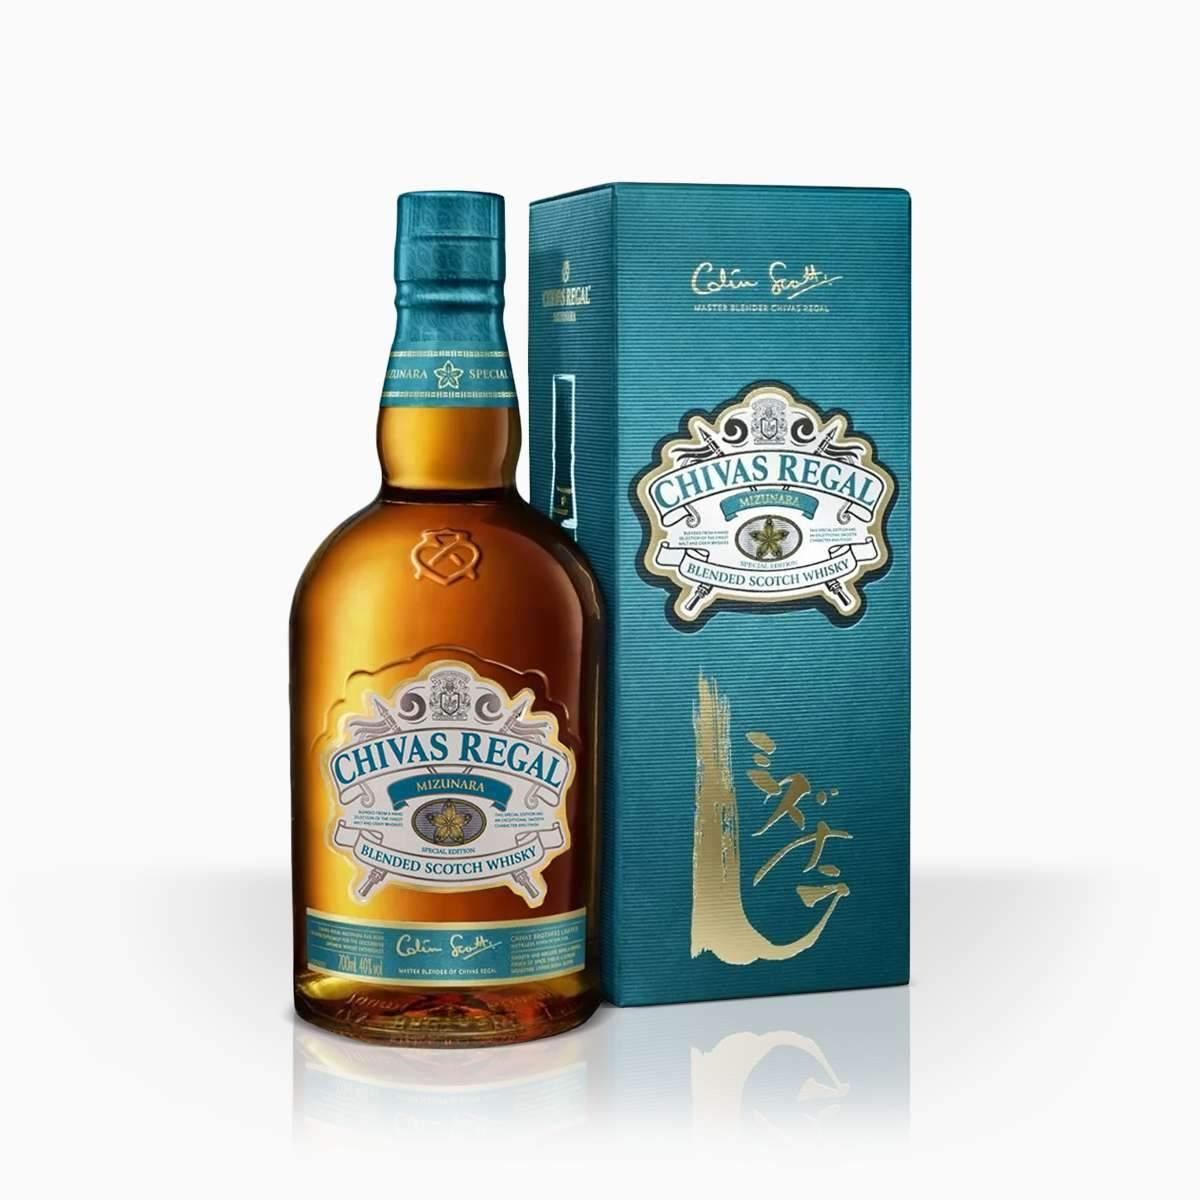 Whisky Chivas Regal Mizunara 40% 0,7l